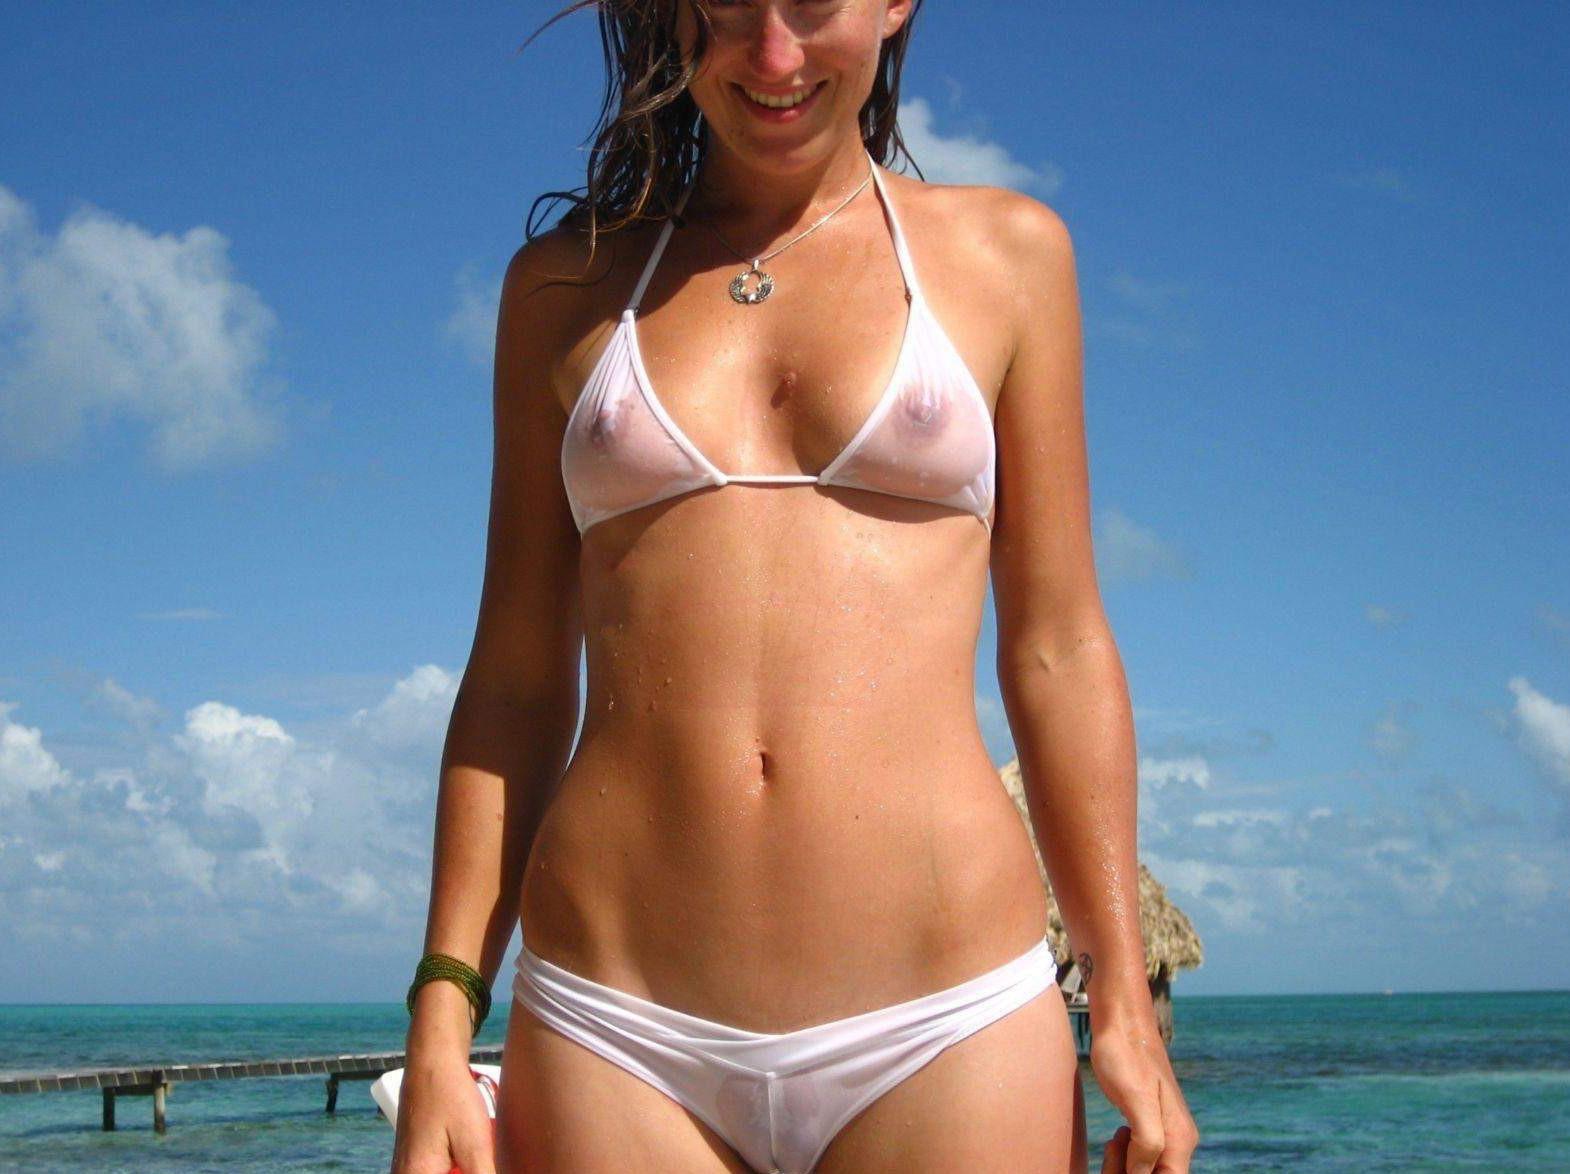 Sexy Bikini Cameltoe